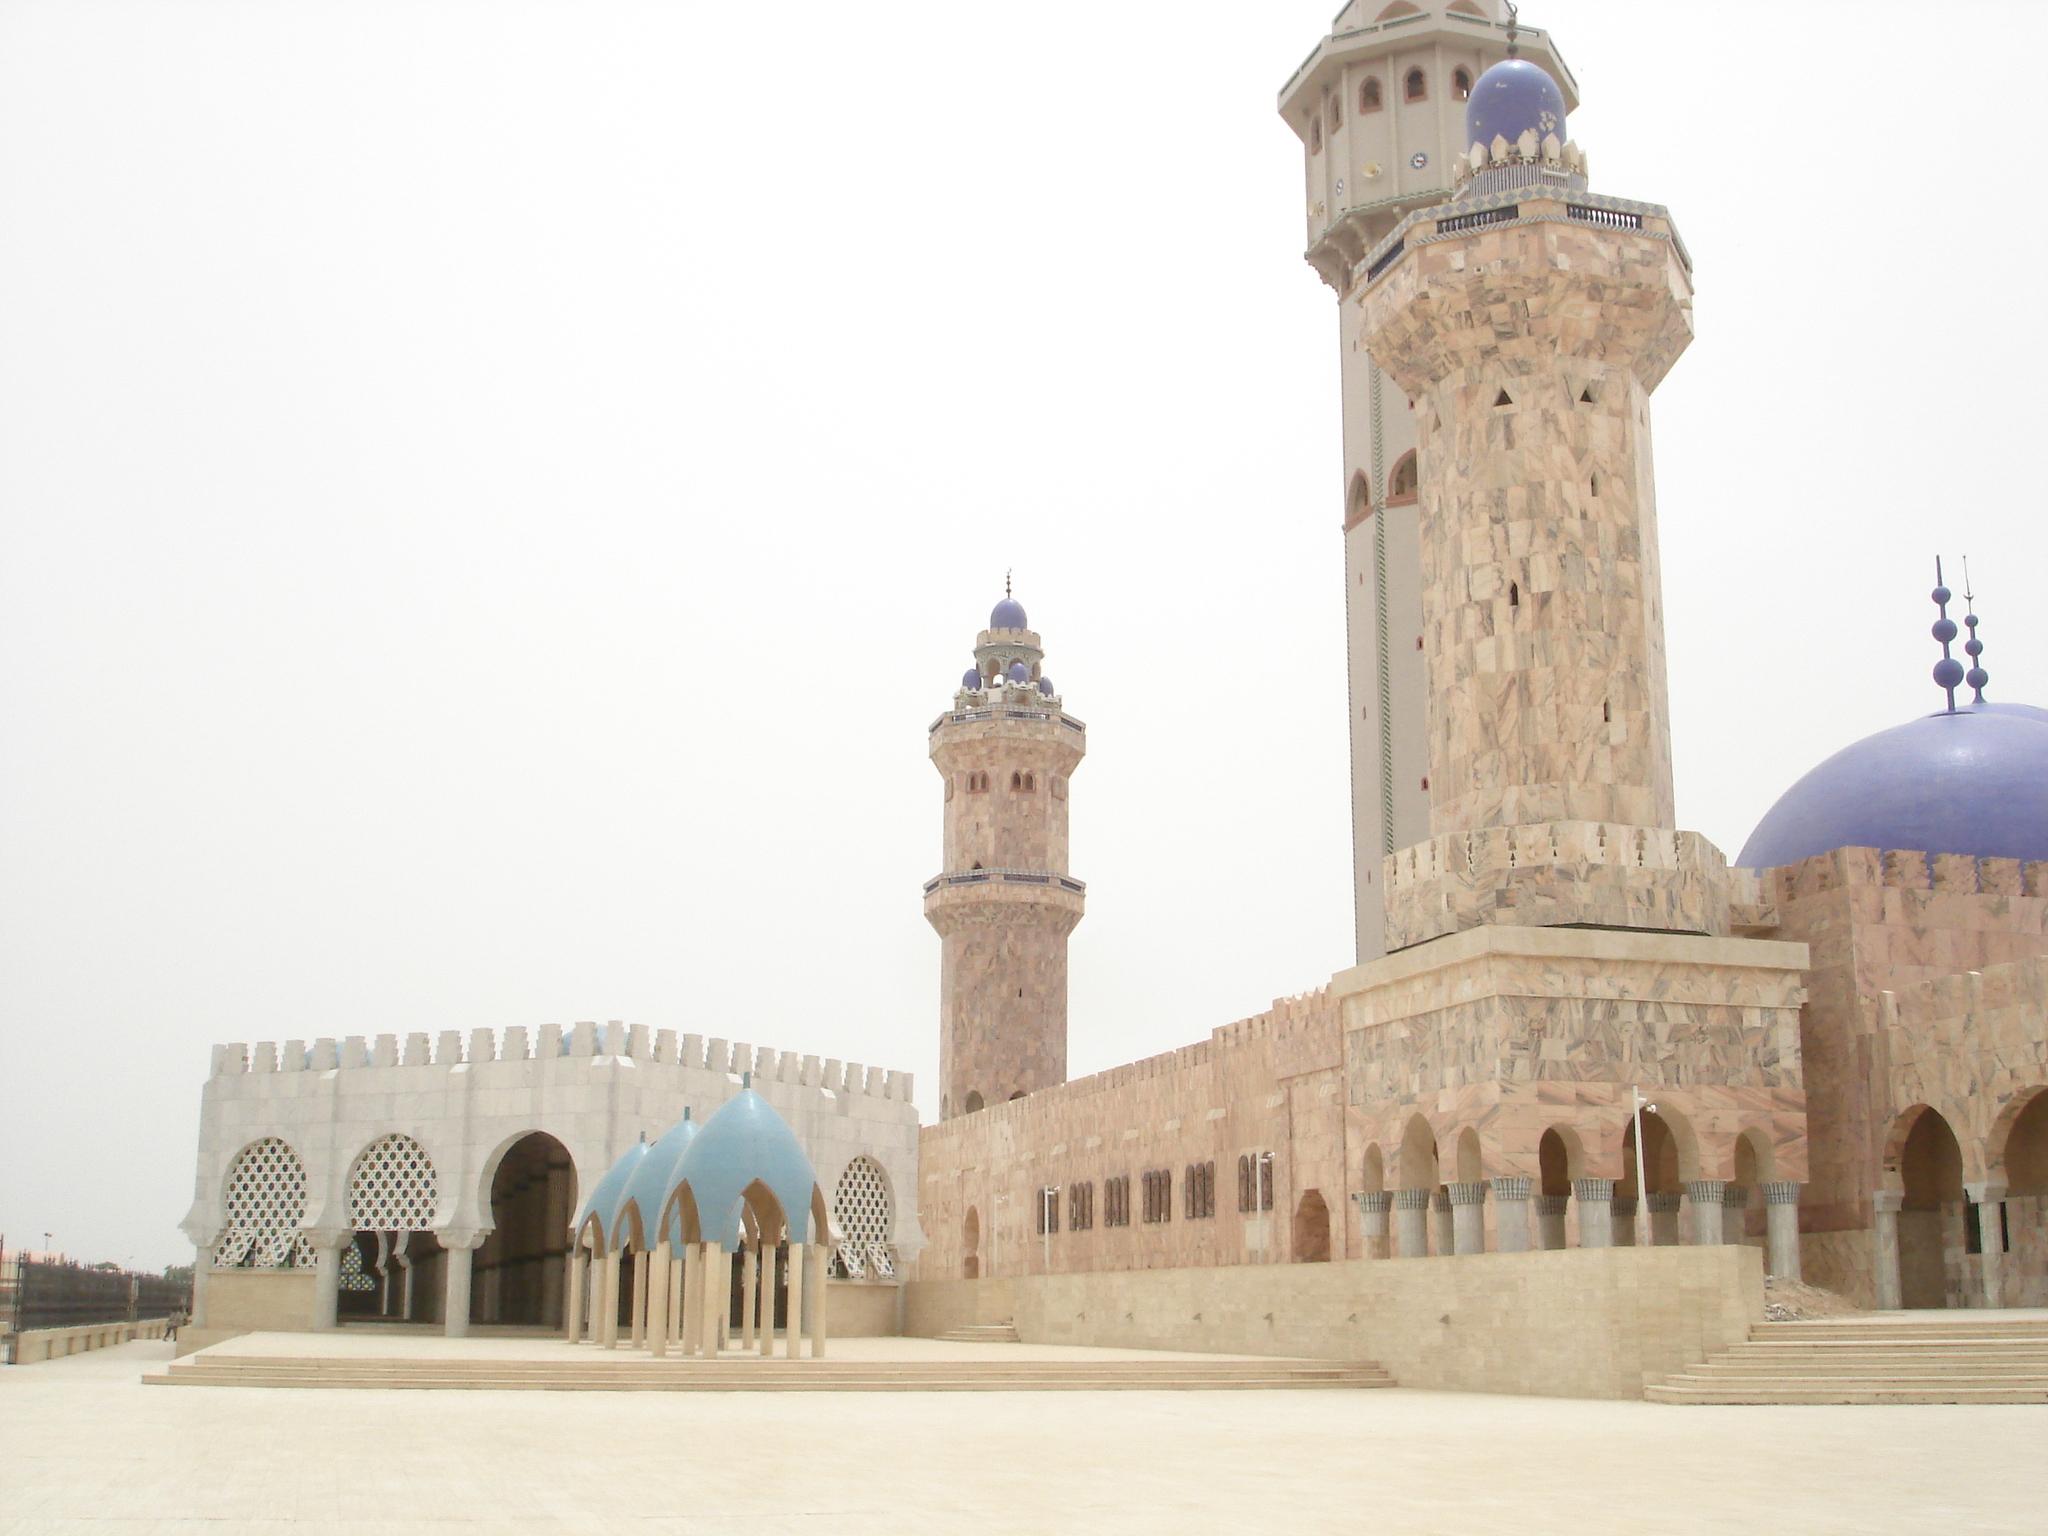 File:Mosquée-Touba (senegal) 2006 (1114).JPG - Wikimedia Commons